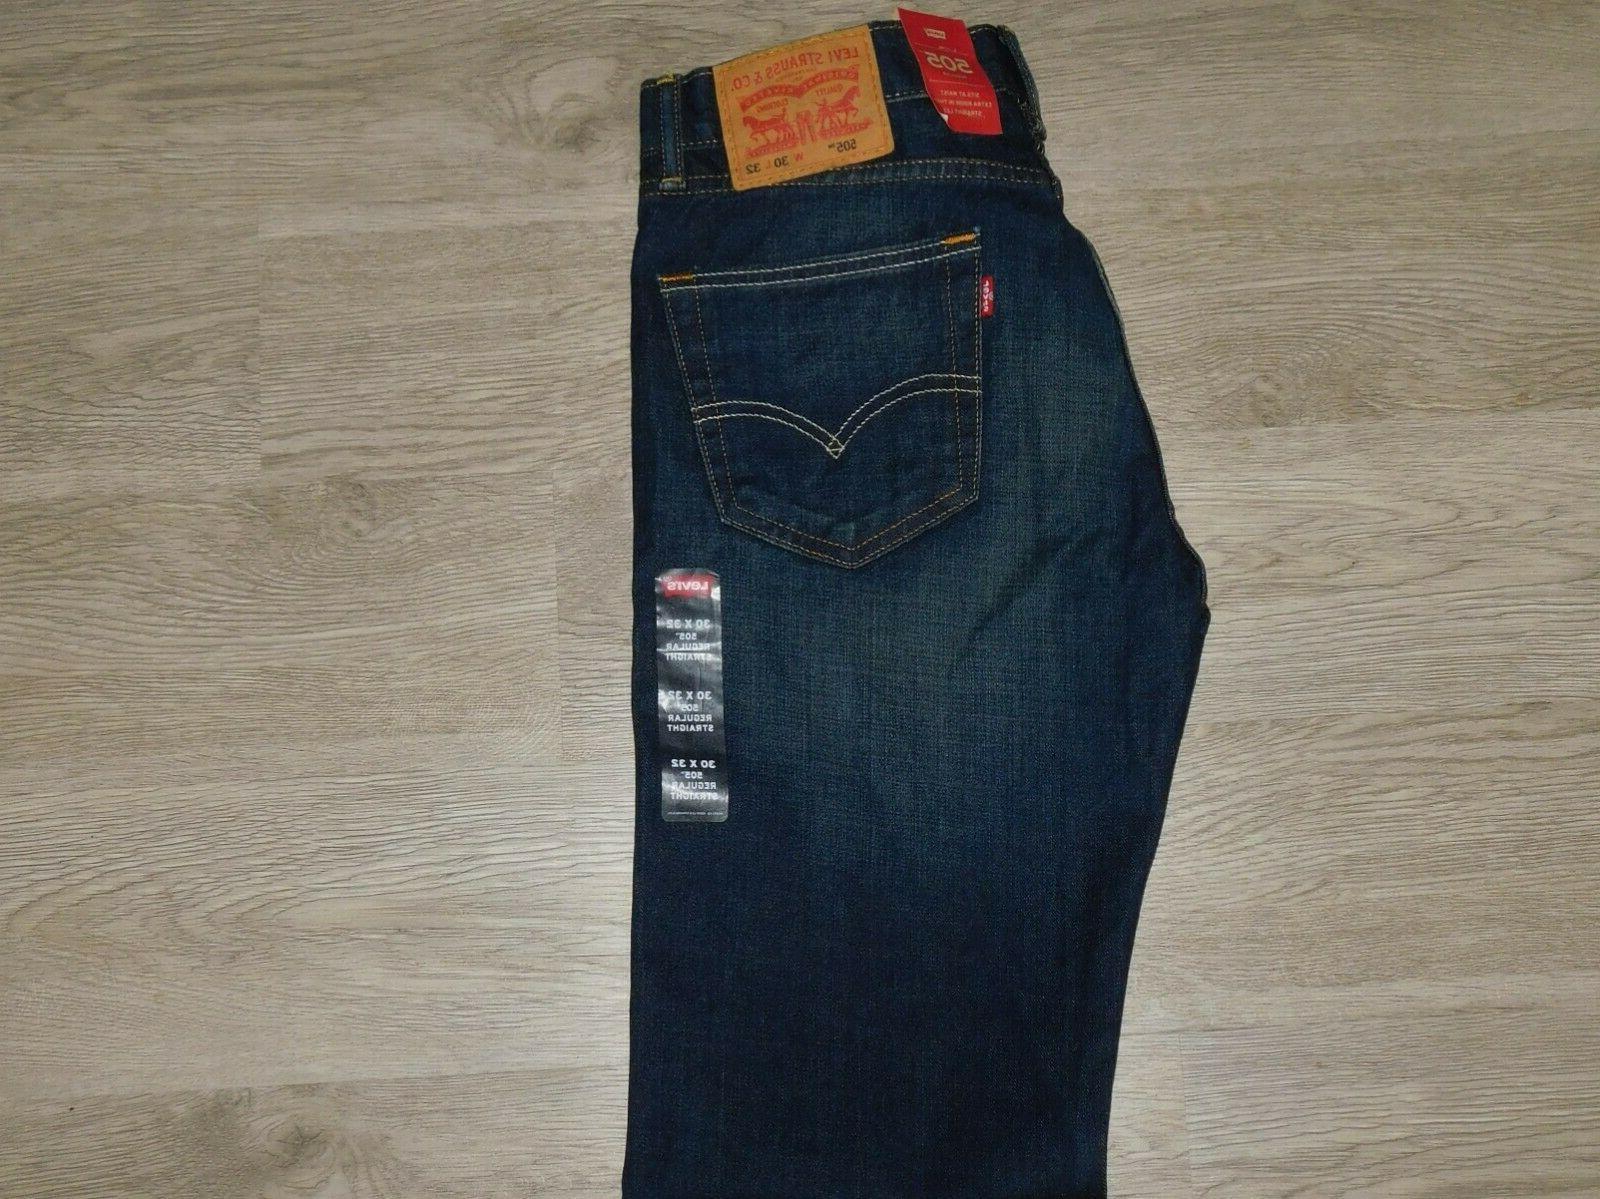 LEVIS Jeans Springstein Blue Size